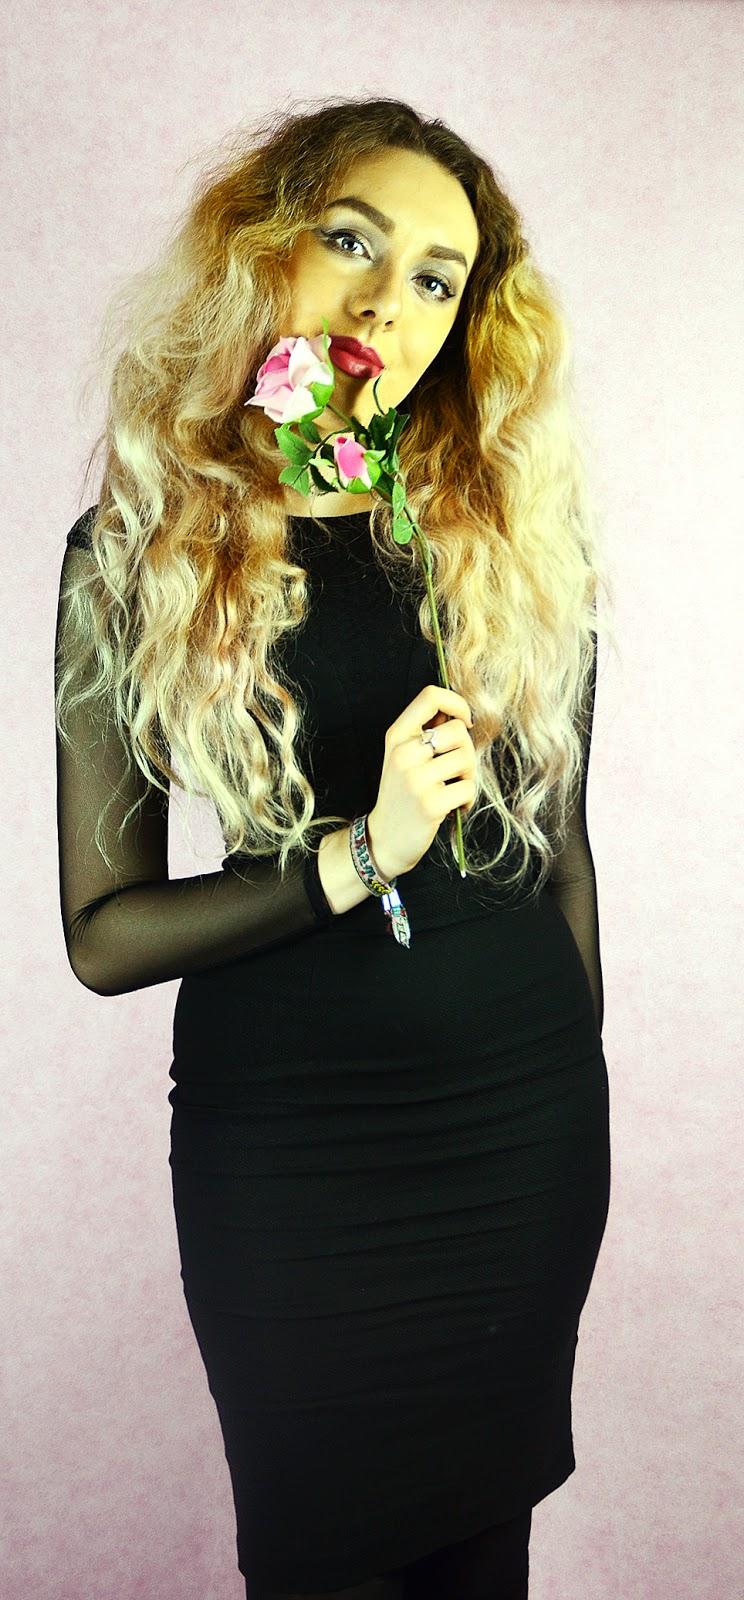 Hybrid Haeley Mesh Sleeve Dress with Lace Detail Black, pink hair, stephi lareine, blogger, rose